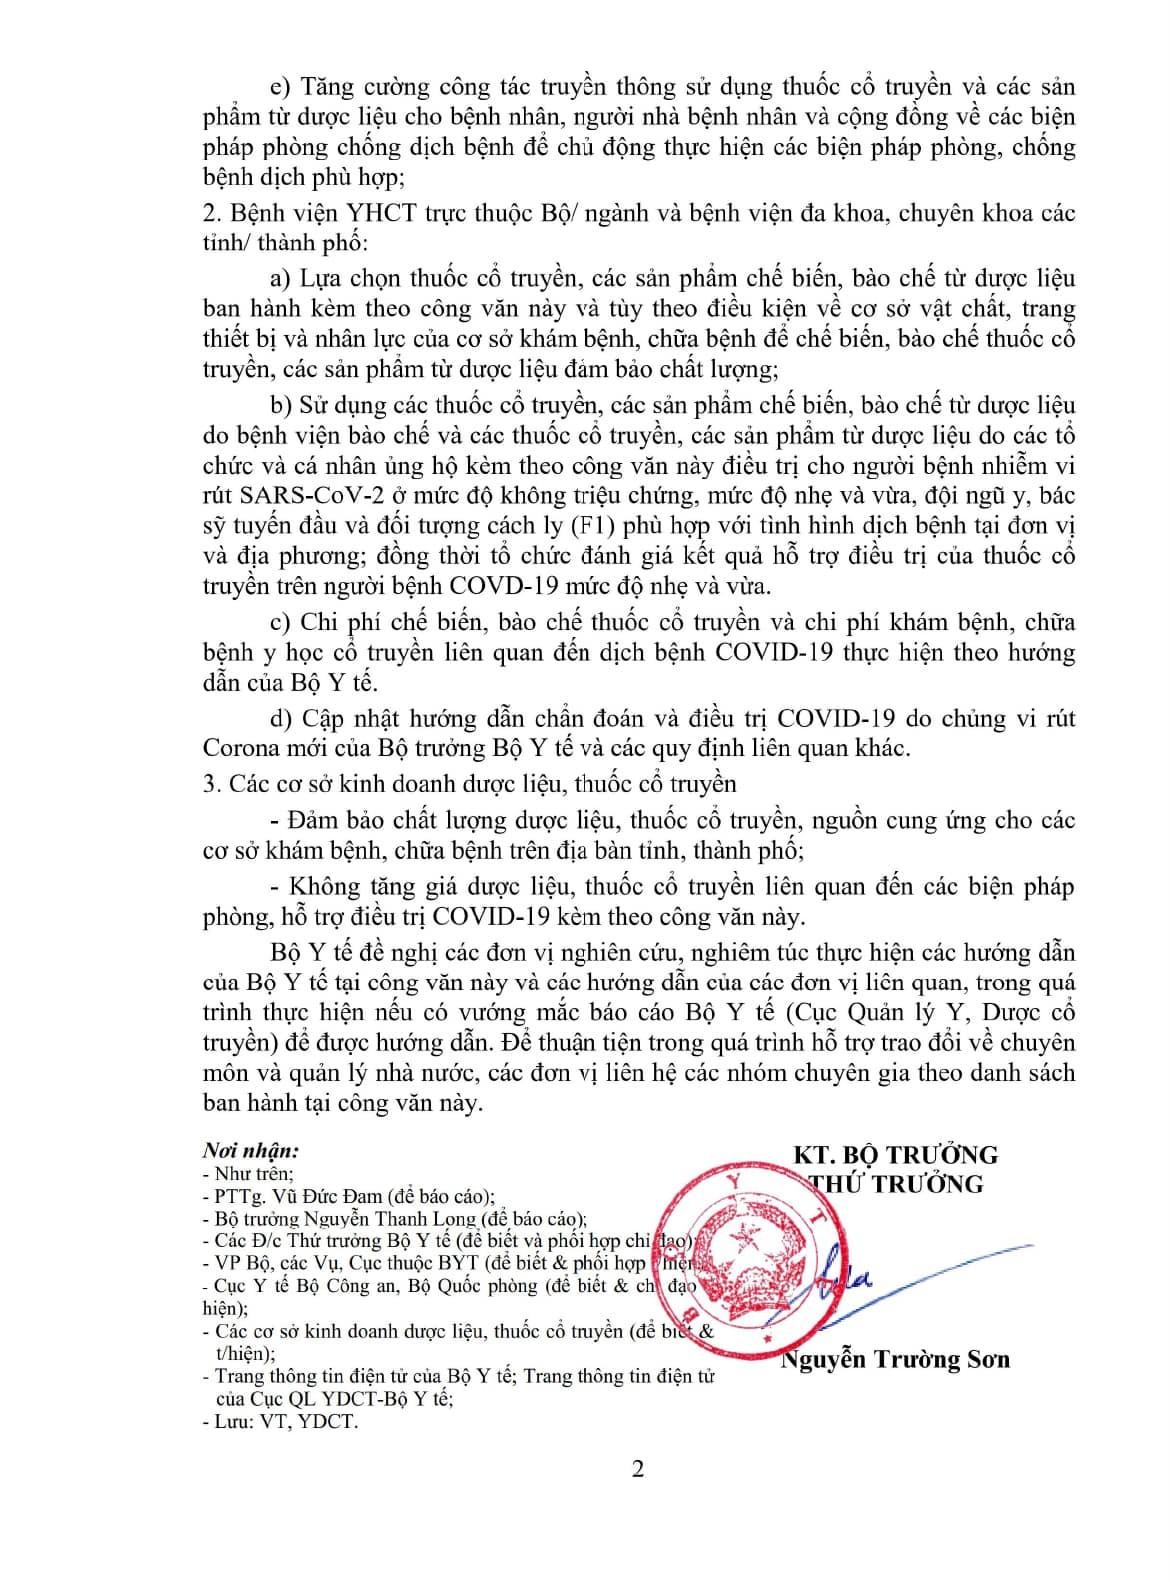 12-loai-thuoc-co-truyen-ho-tro-dieu-tri-covid-3-1627269605.jpg